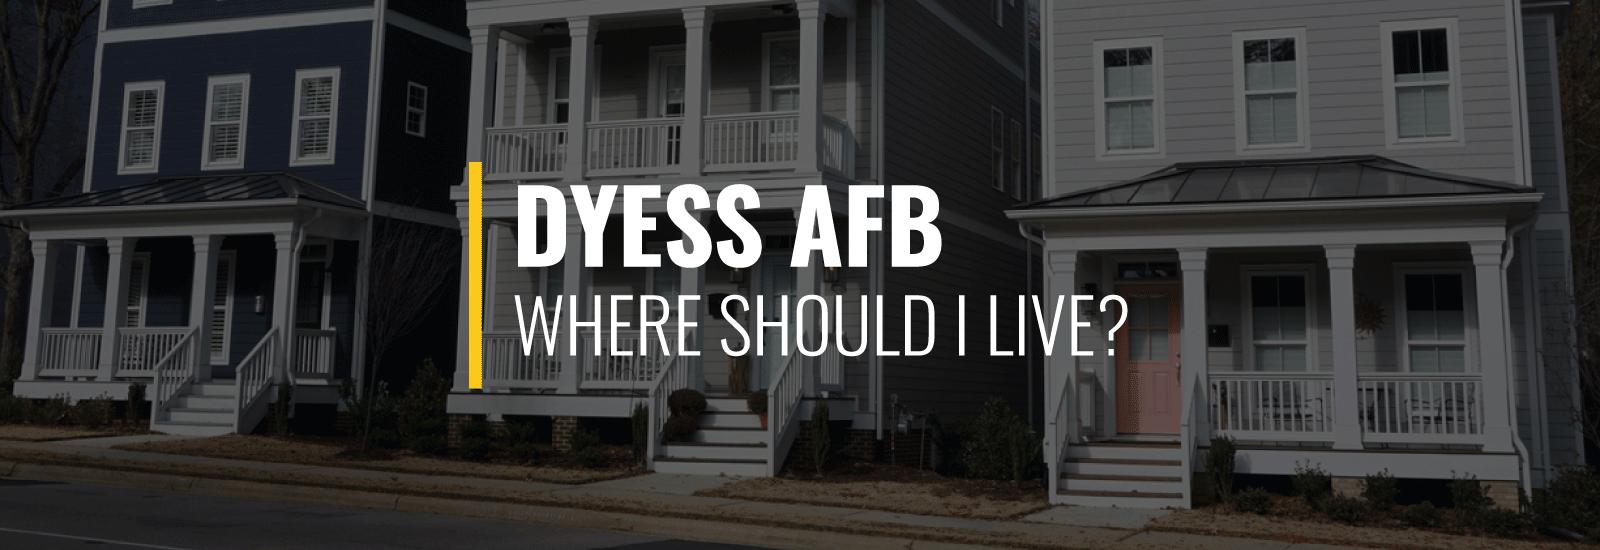 Where Should I Live Near Dyess AFB?